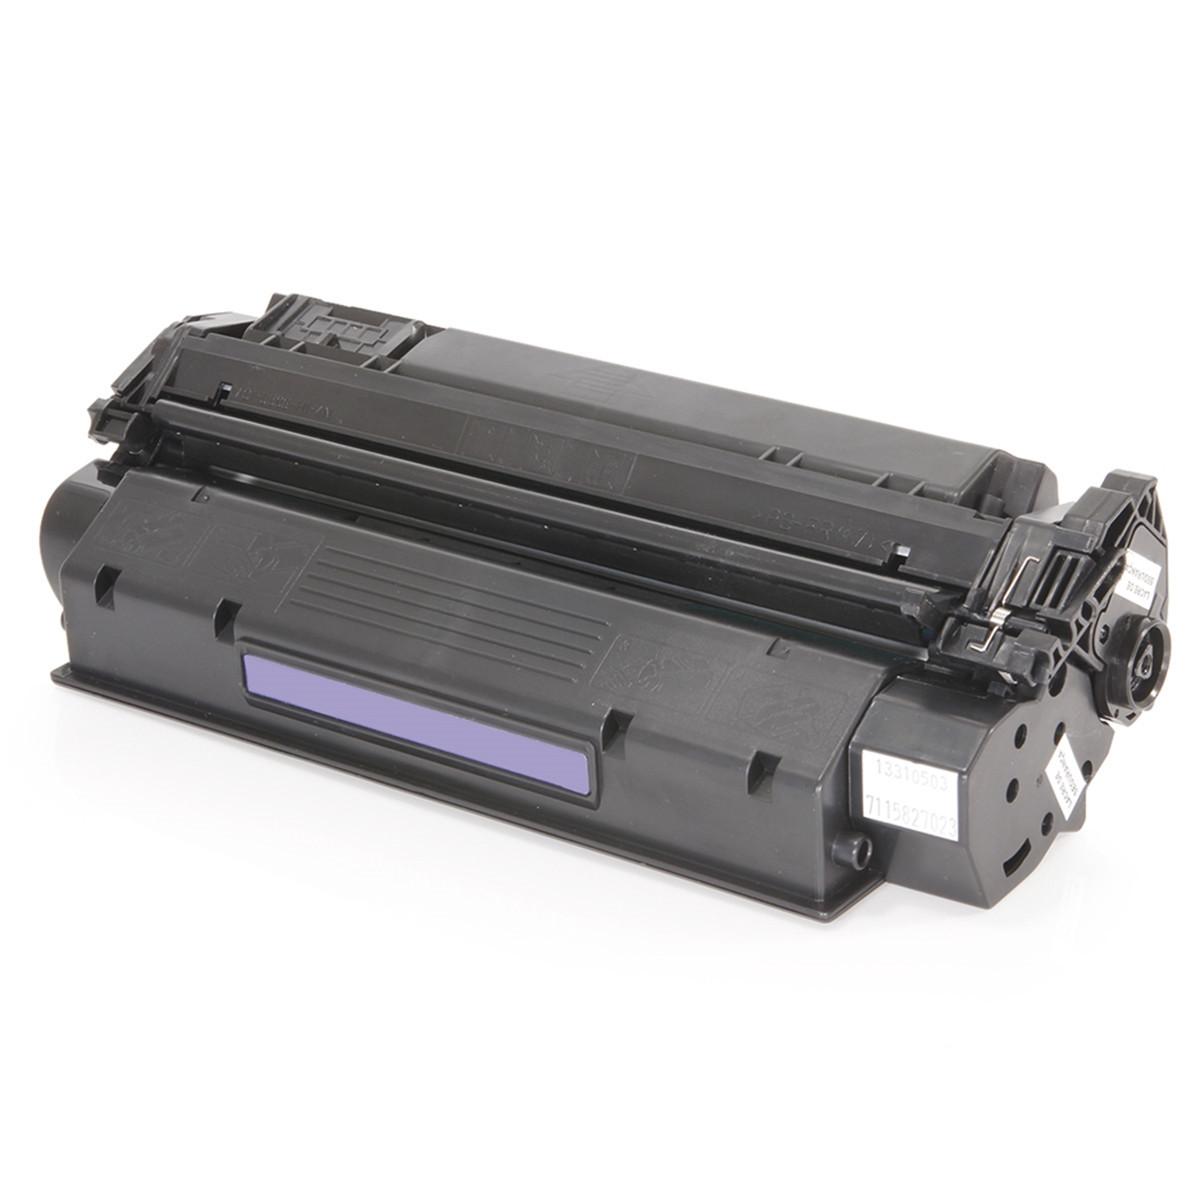 Toner Compatível com HP C7115A 15A | 1000 1200 1200N 1200SE 1220 1220SE 3300 Premium 2.5k